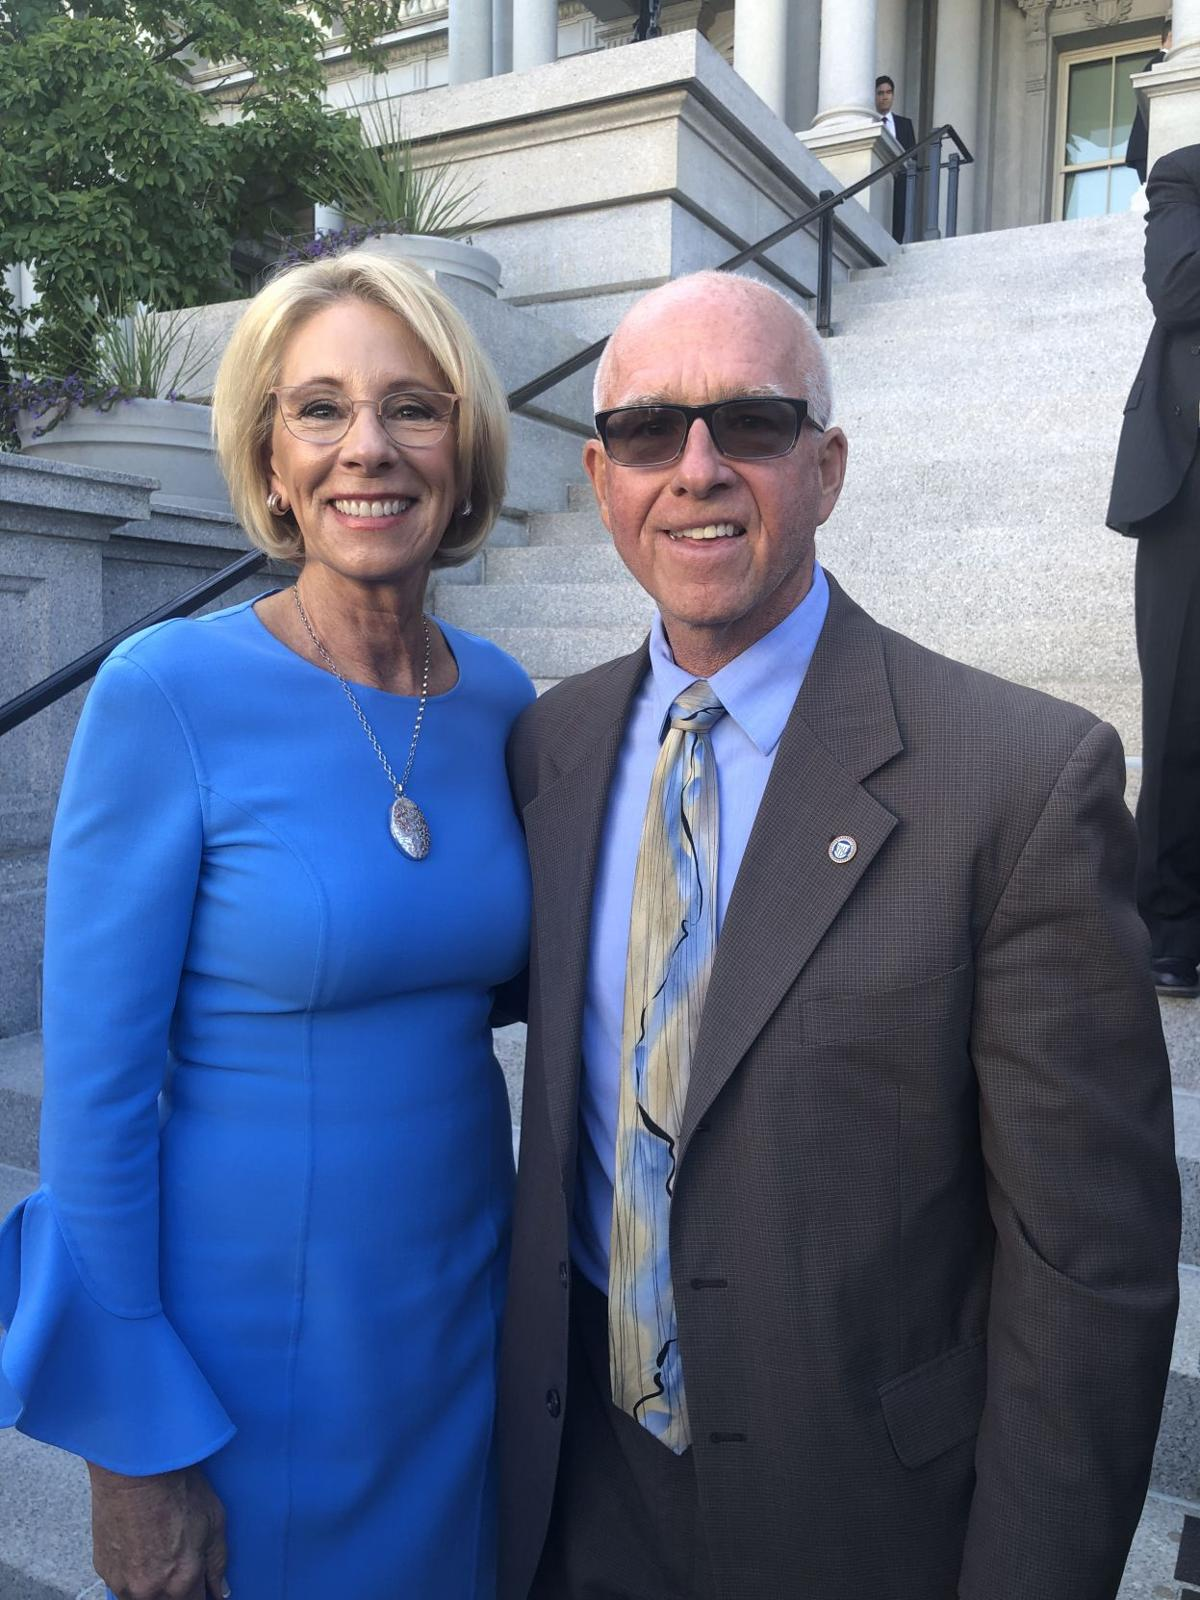 Principal Dave Dunn and Secretary Betsy DeVos